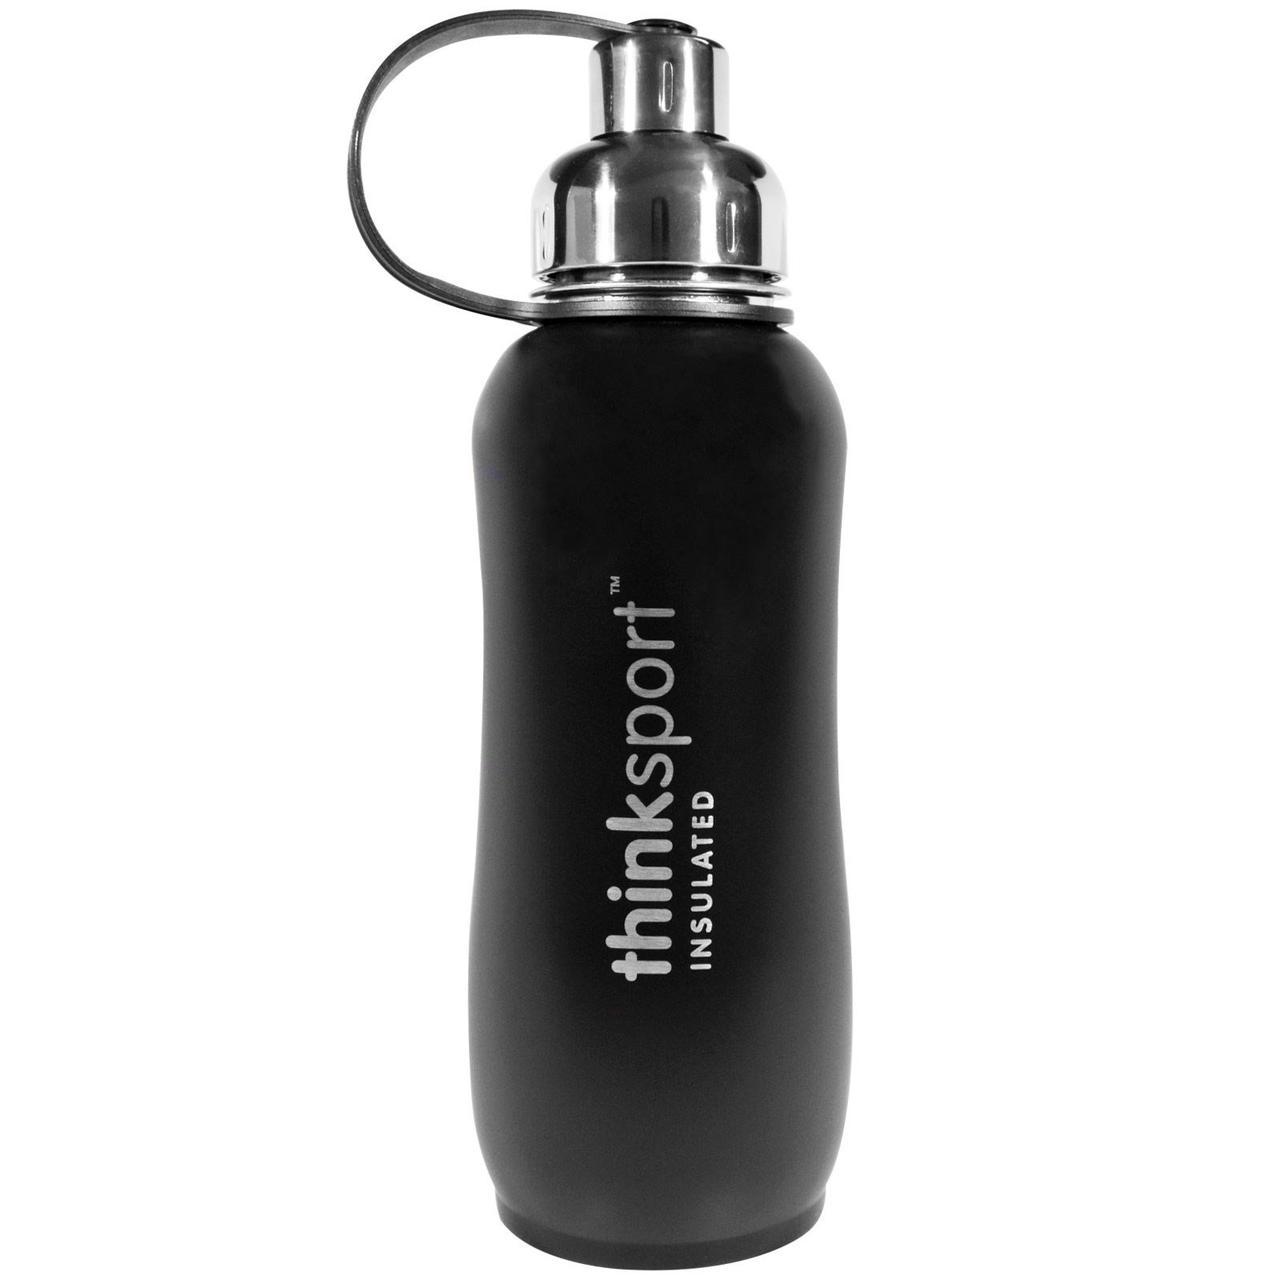 Изолированная спортивная бутылка,Sports Bottle, Черная, Think, 750 мл